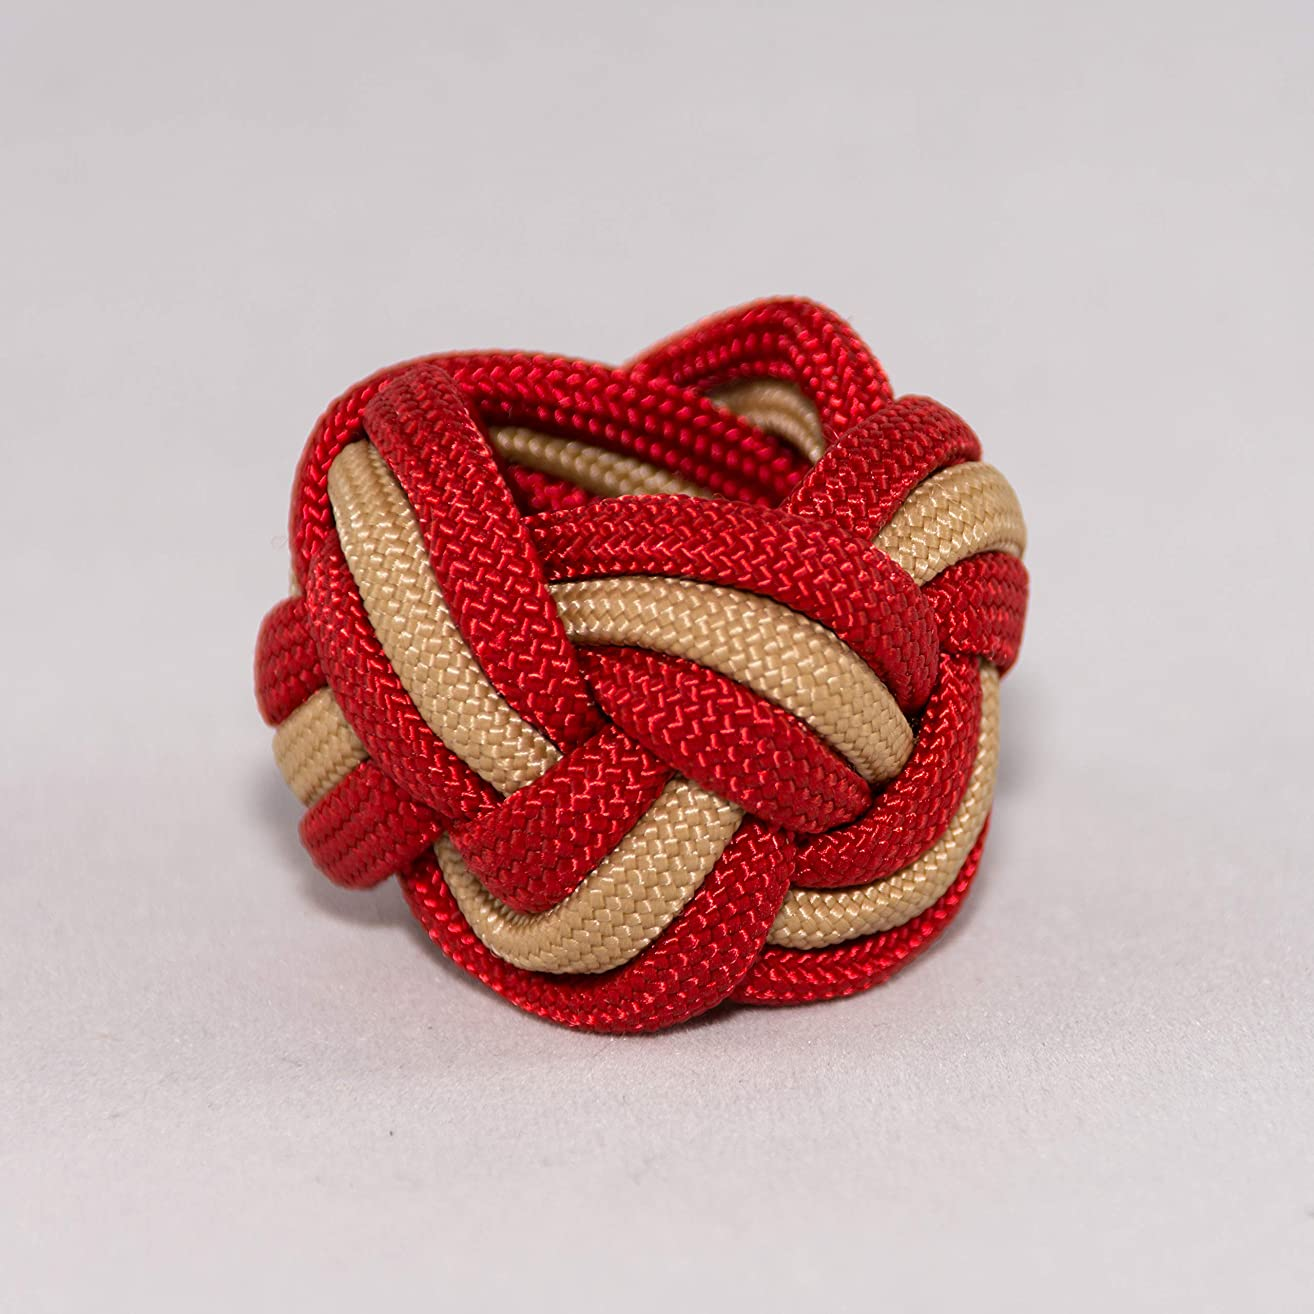 Scout Neckerchief Slide Woggle Turks Head Knot